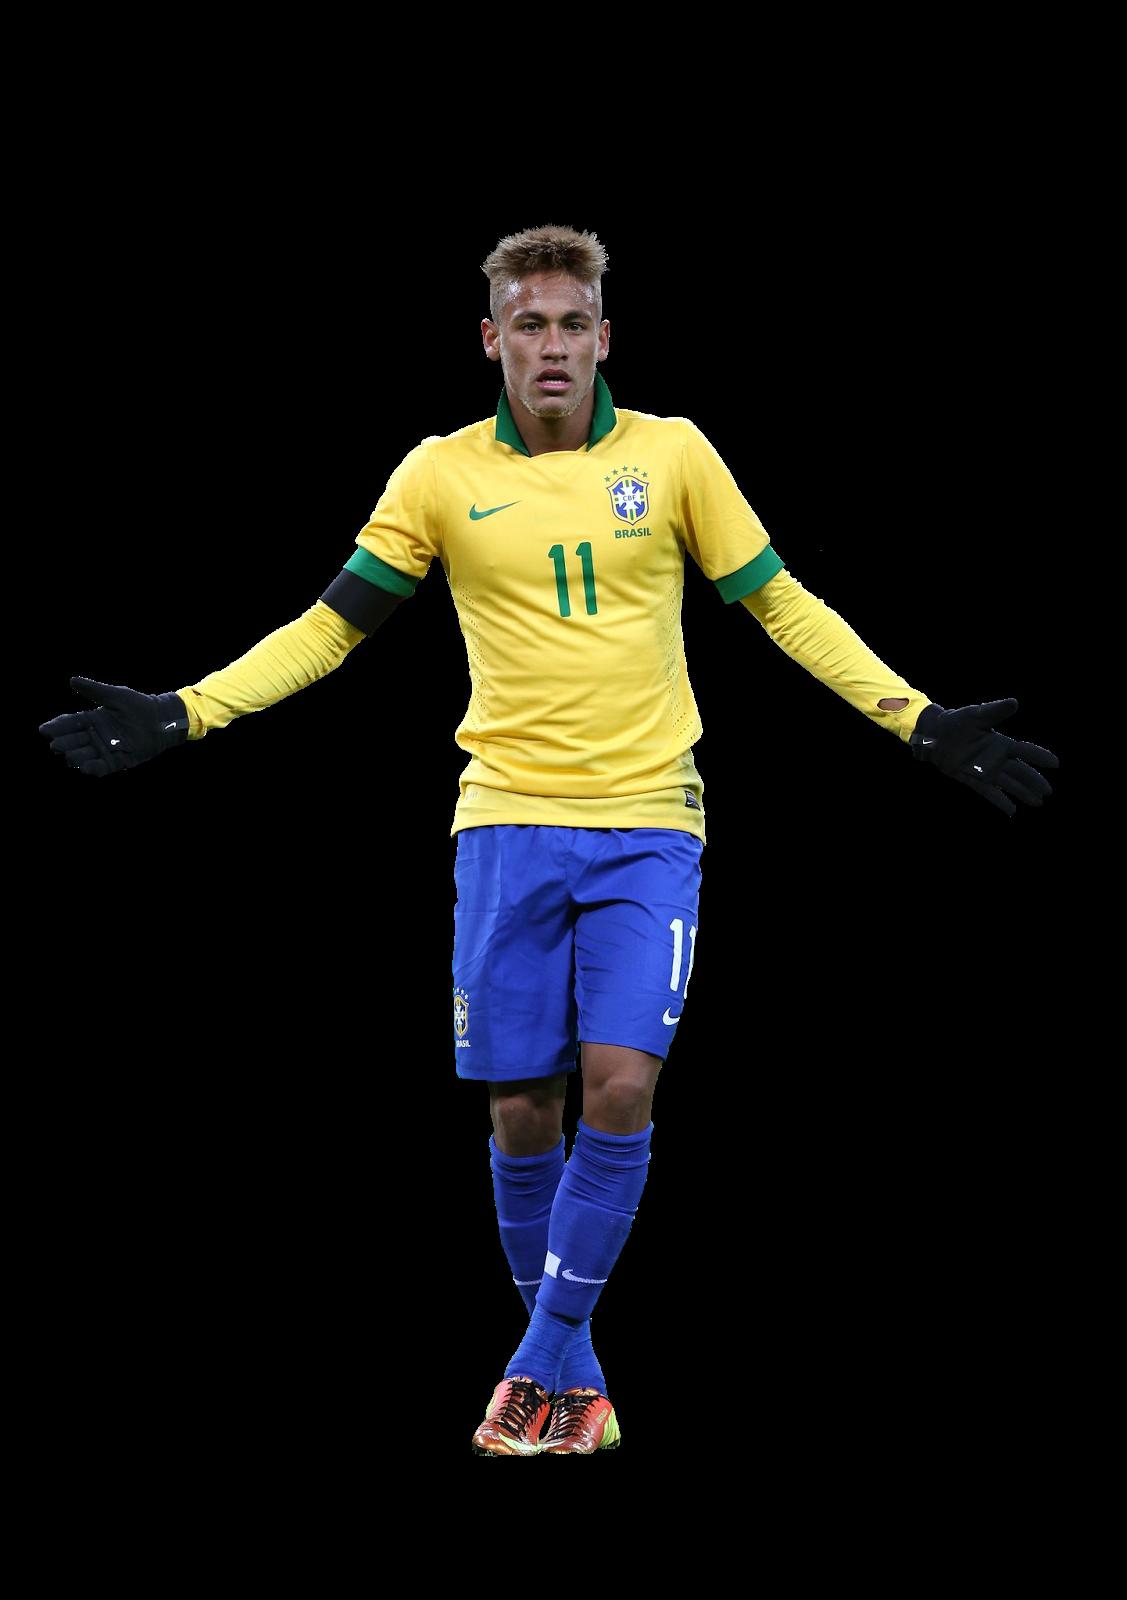 Football player emoji clipart graphic transparent library Neymar 11 Brazil Png Team Football graphic transparent library